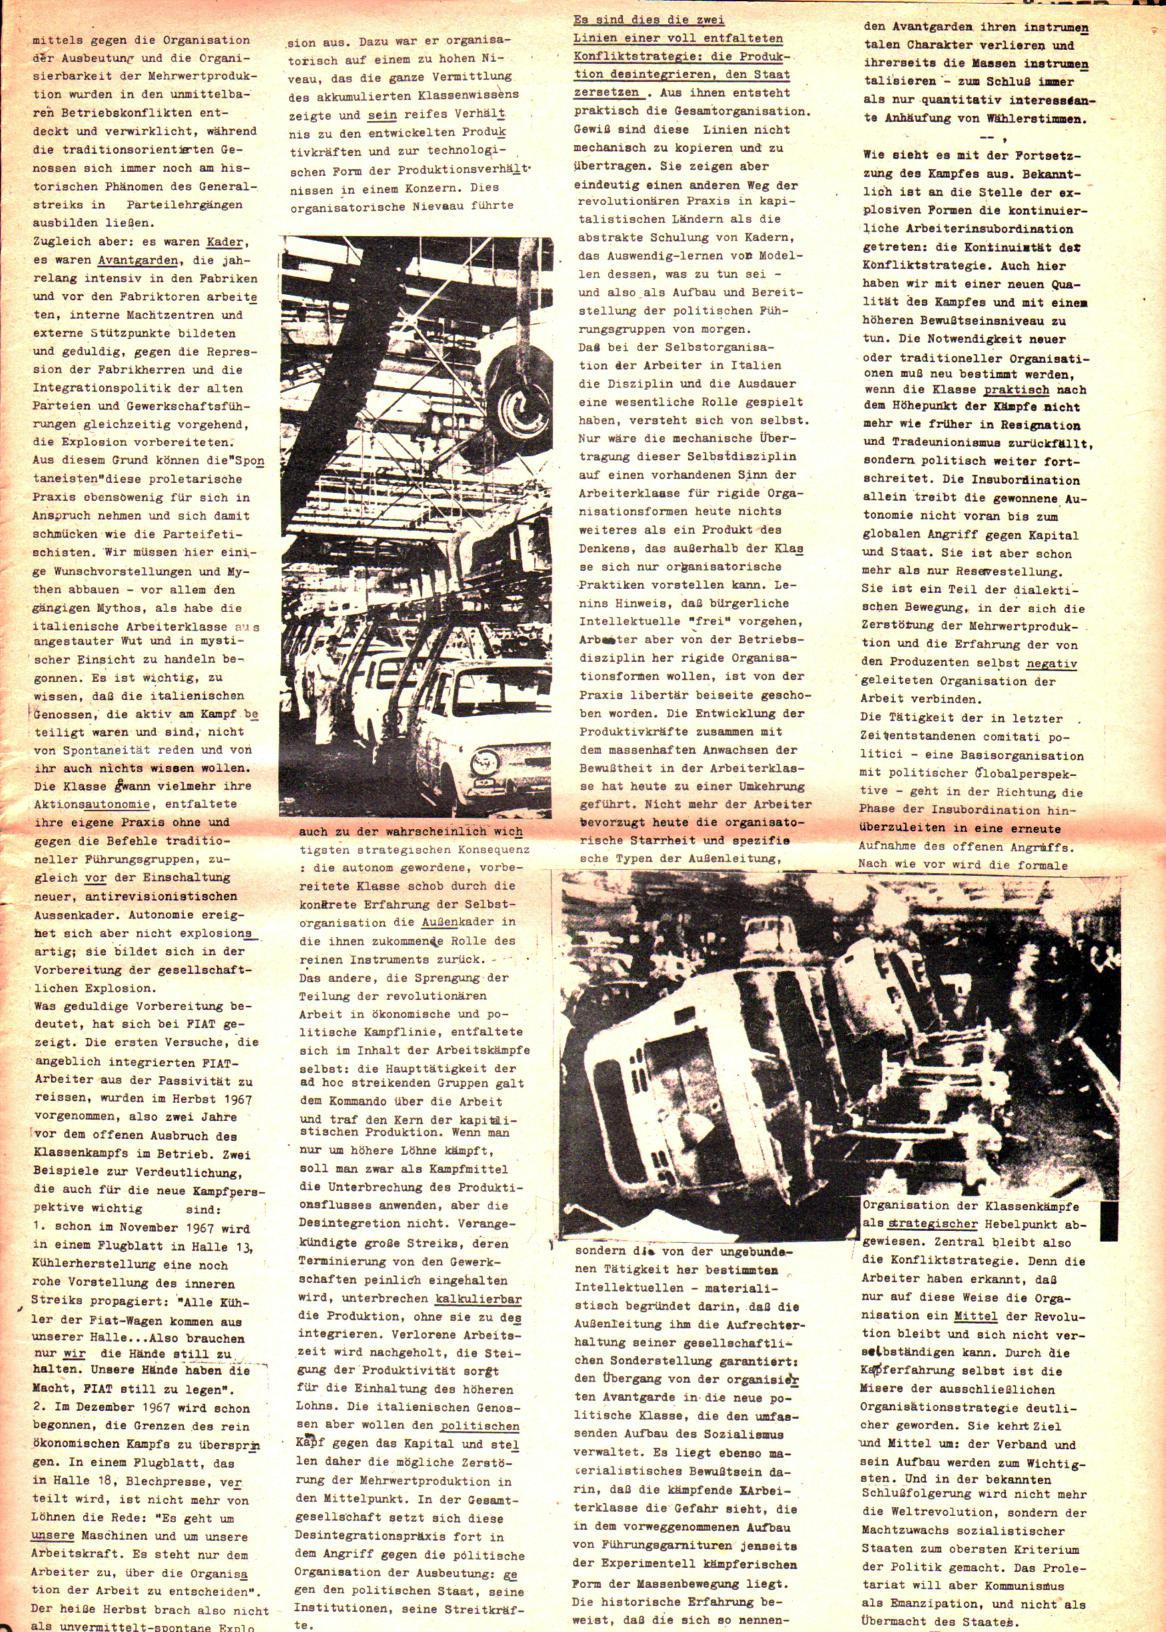 Berlin_Hochschulkampf_1971_11_09